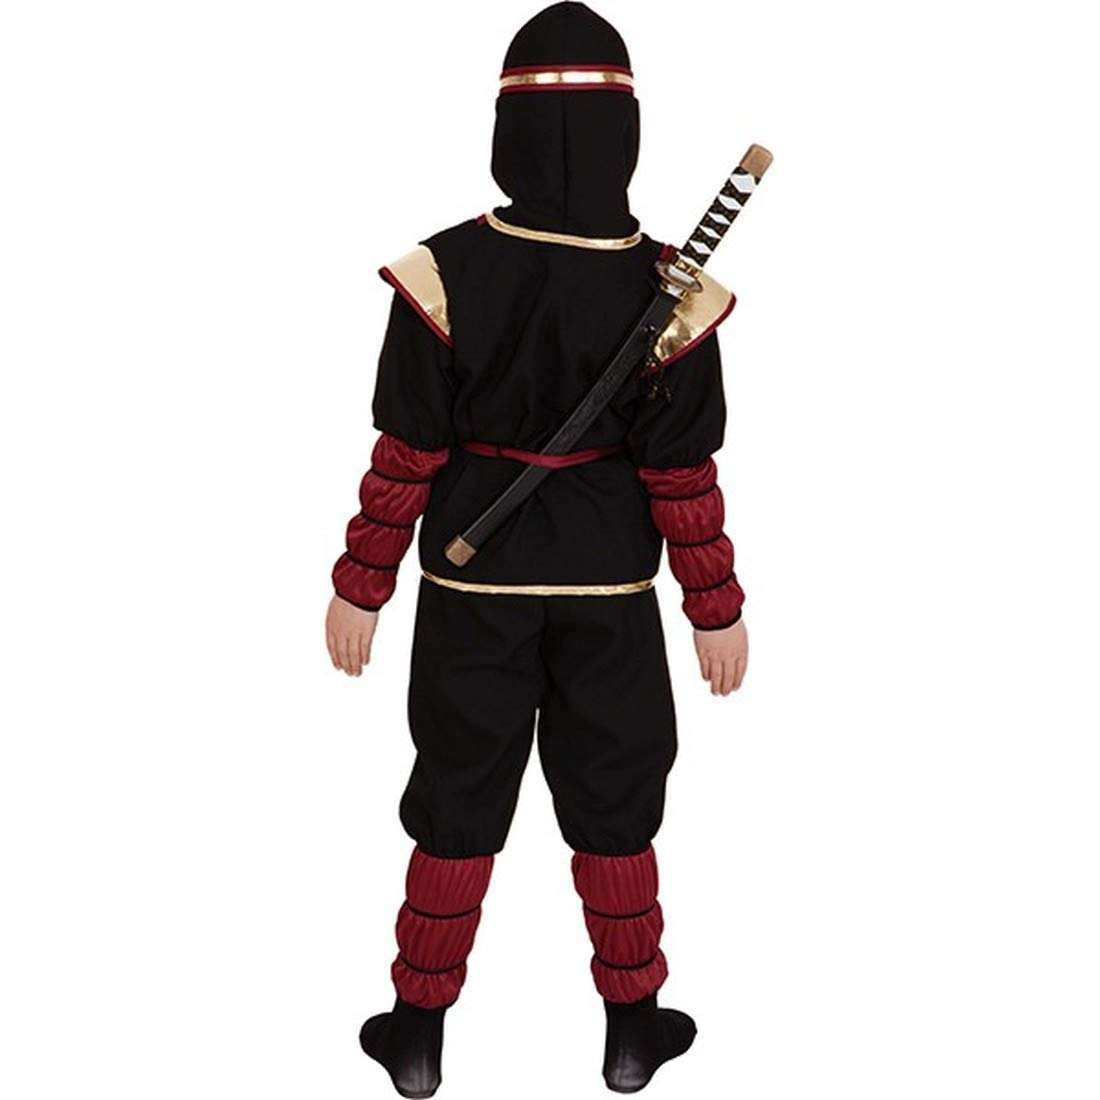 NET TOYS Luchador Ninja Disfraz para niños   Negro-Rojo ...